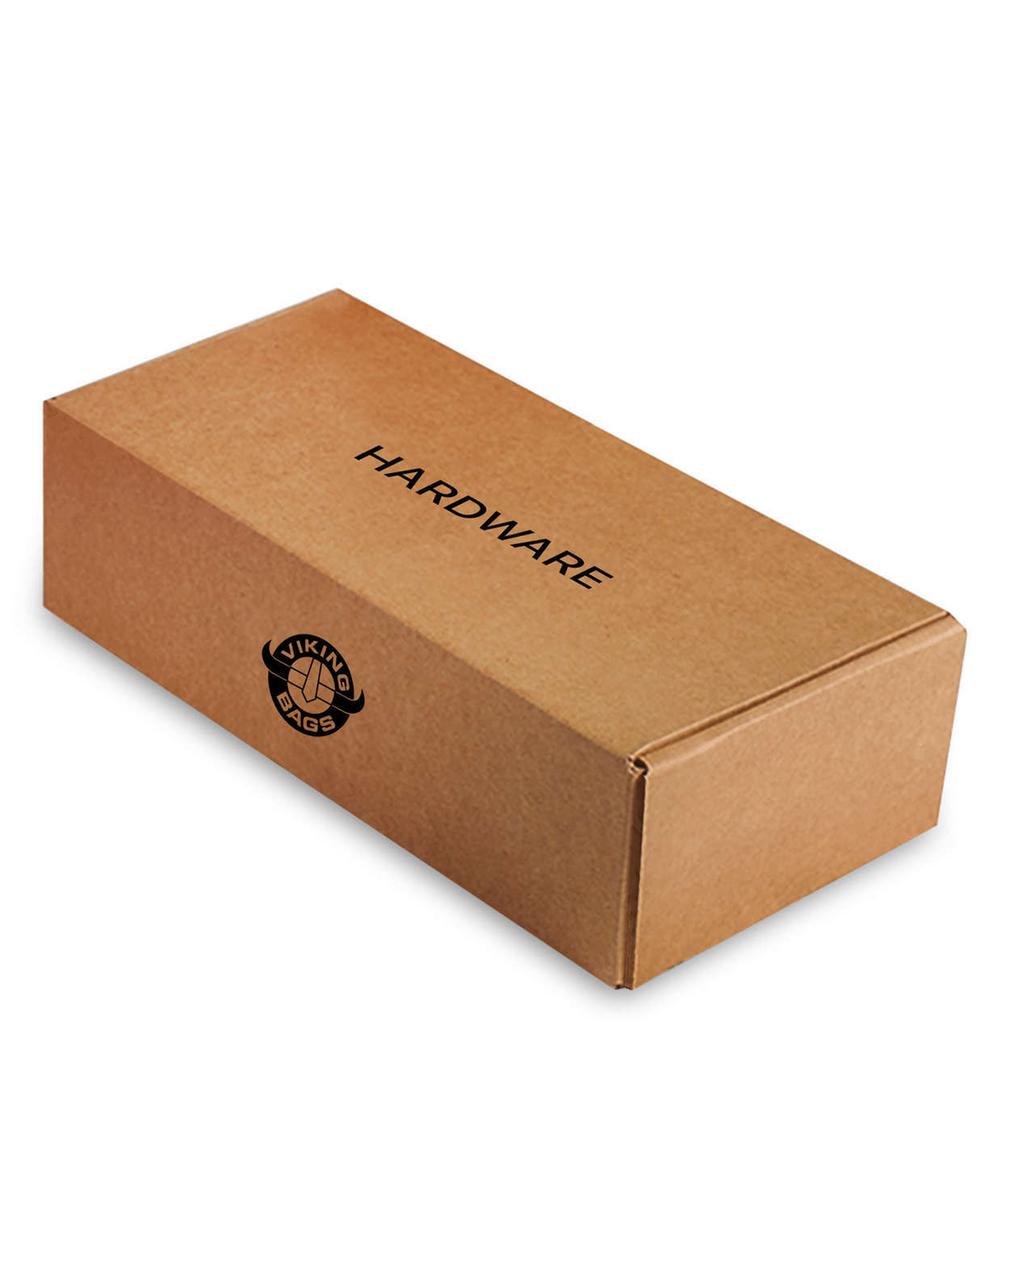 Triumph Thunderbird Viking Raven Large Leather Motorcycle Saddlebags Box